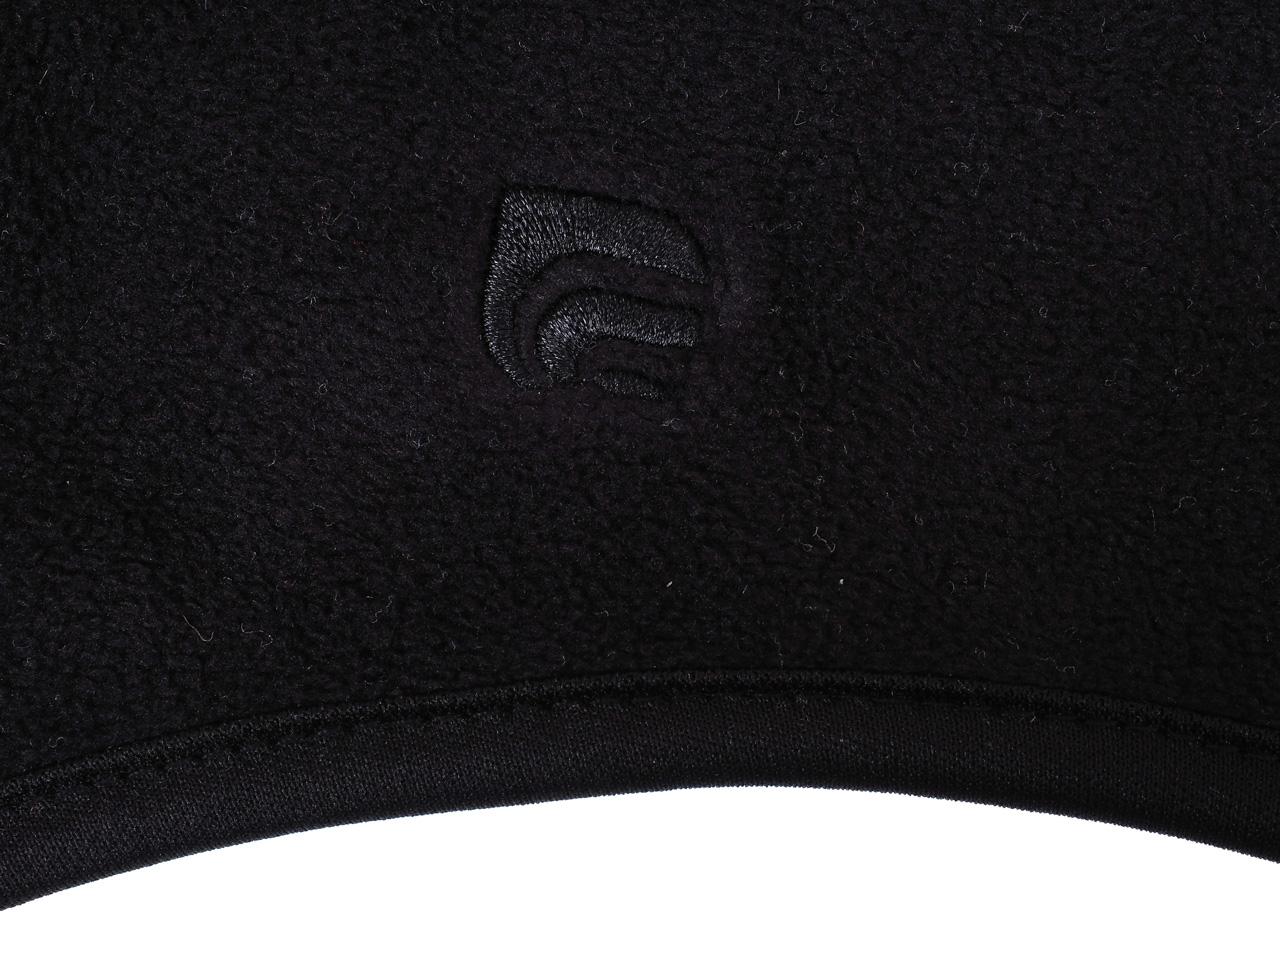 Hood-Winter-Cairn-Hood-Black-Polar-Jr-Black-31198-New thumbnail 4